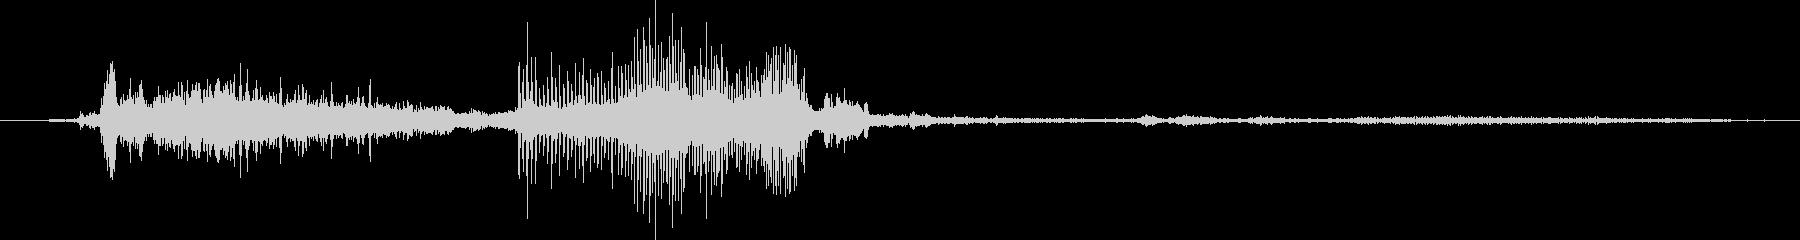 1905 Darracq:アプロー...の未再生の波形